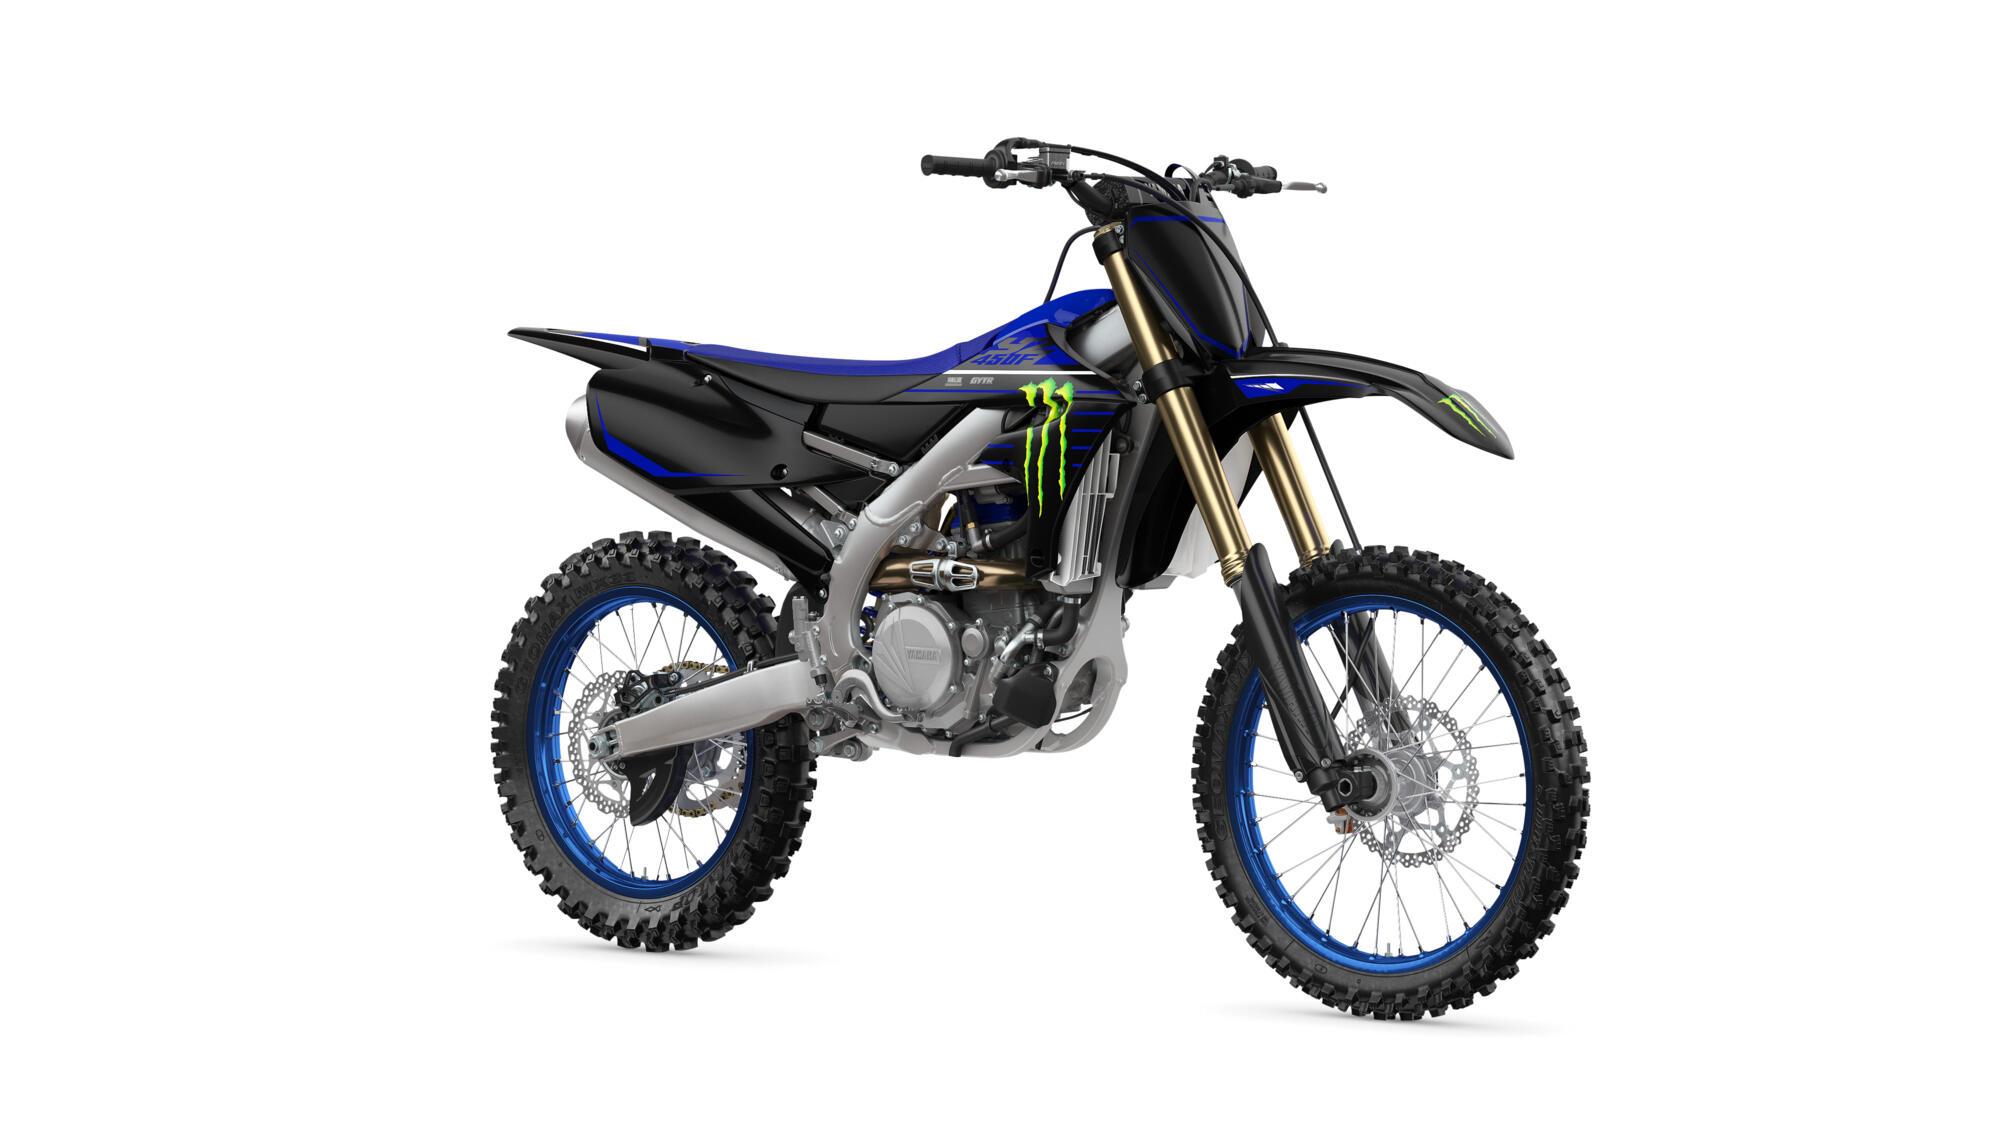 2021-Yamaha-YZ450FSV-EU-Monster_Black_-Studio-001-03